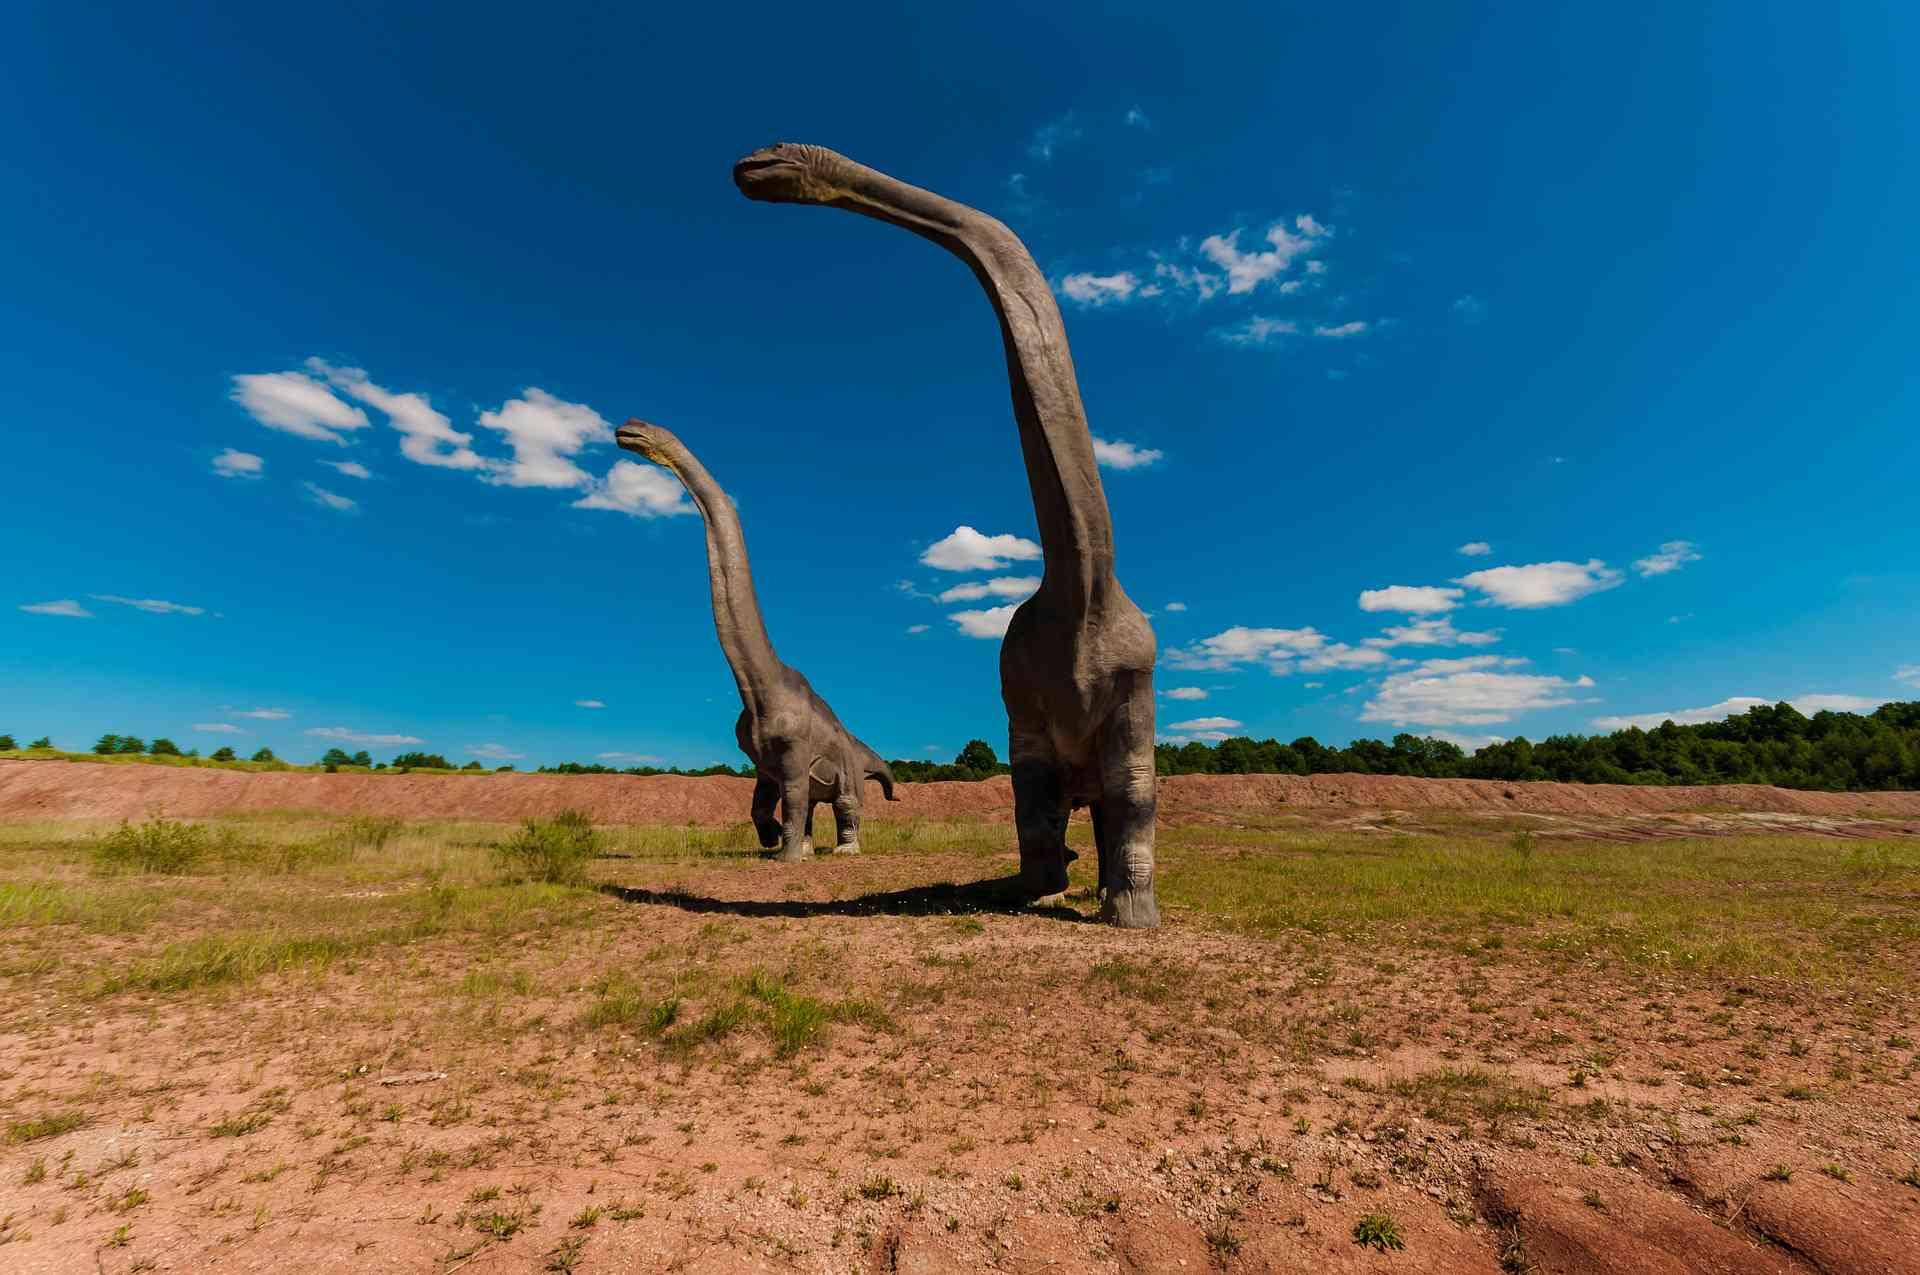 Artist rendering of dinosaurs against a vast landscape.